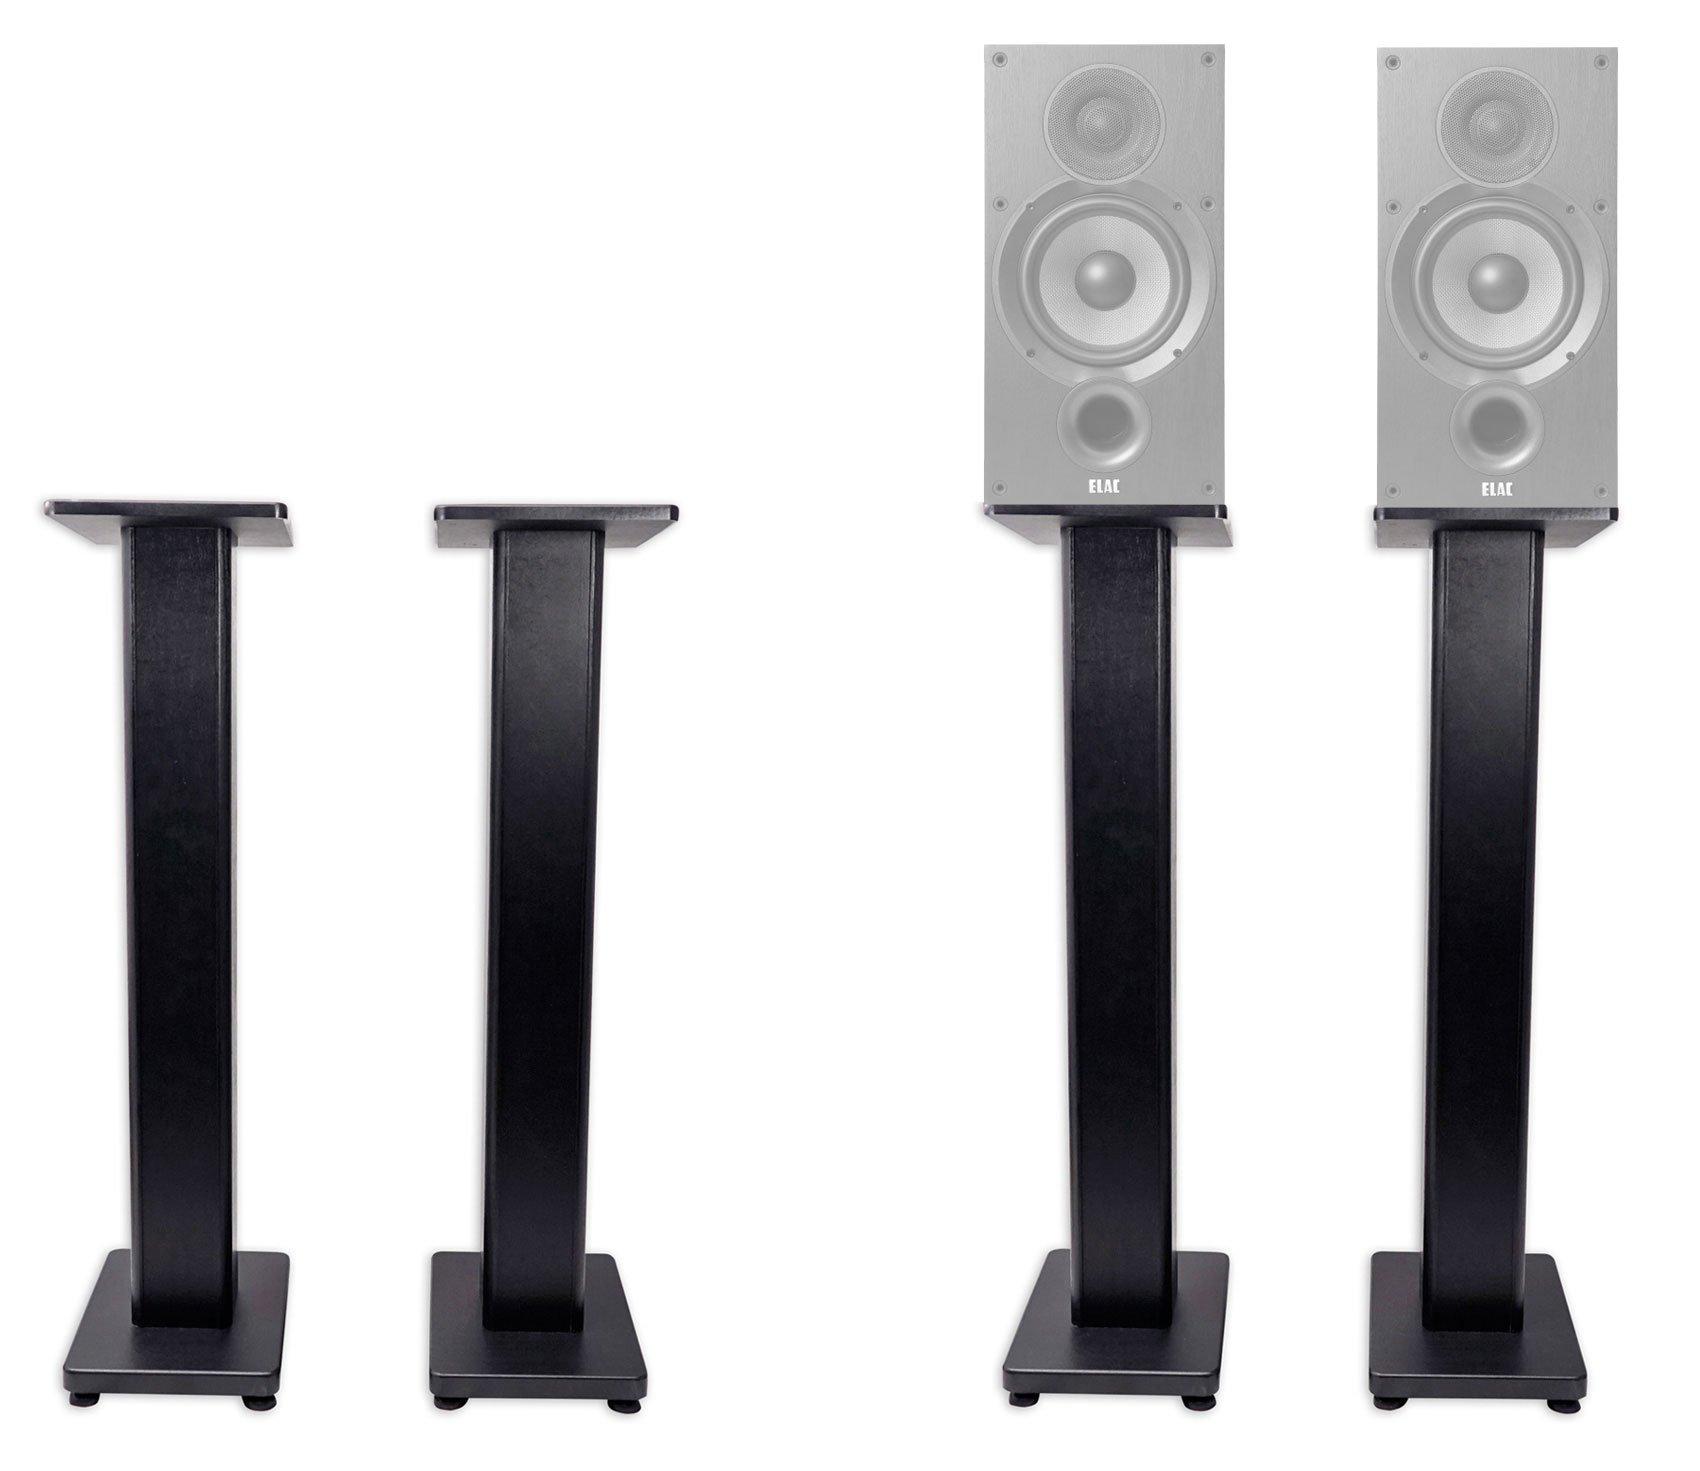 Pair 36'' Bookshelf Speaker Stands For ELAC Debut 2.0 B6.2 Bookshelf Speakers